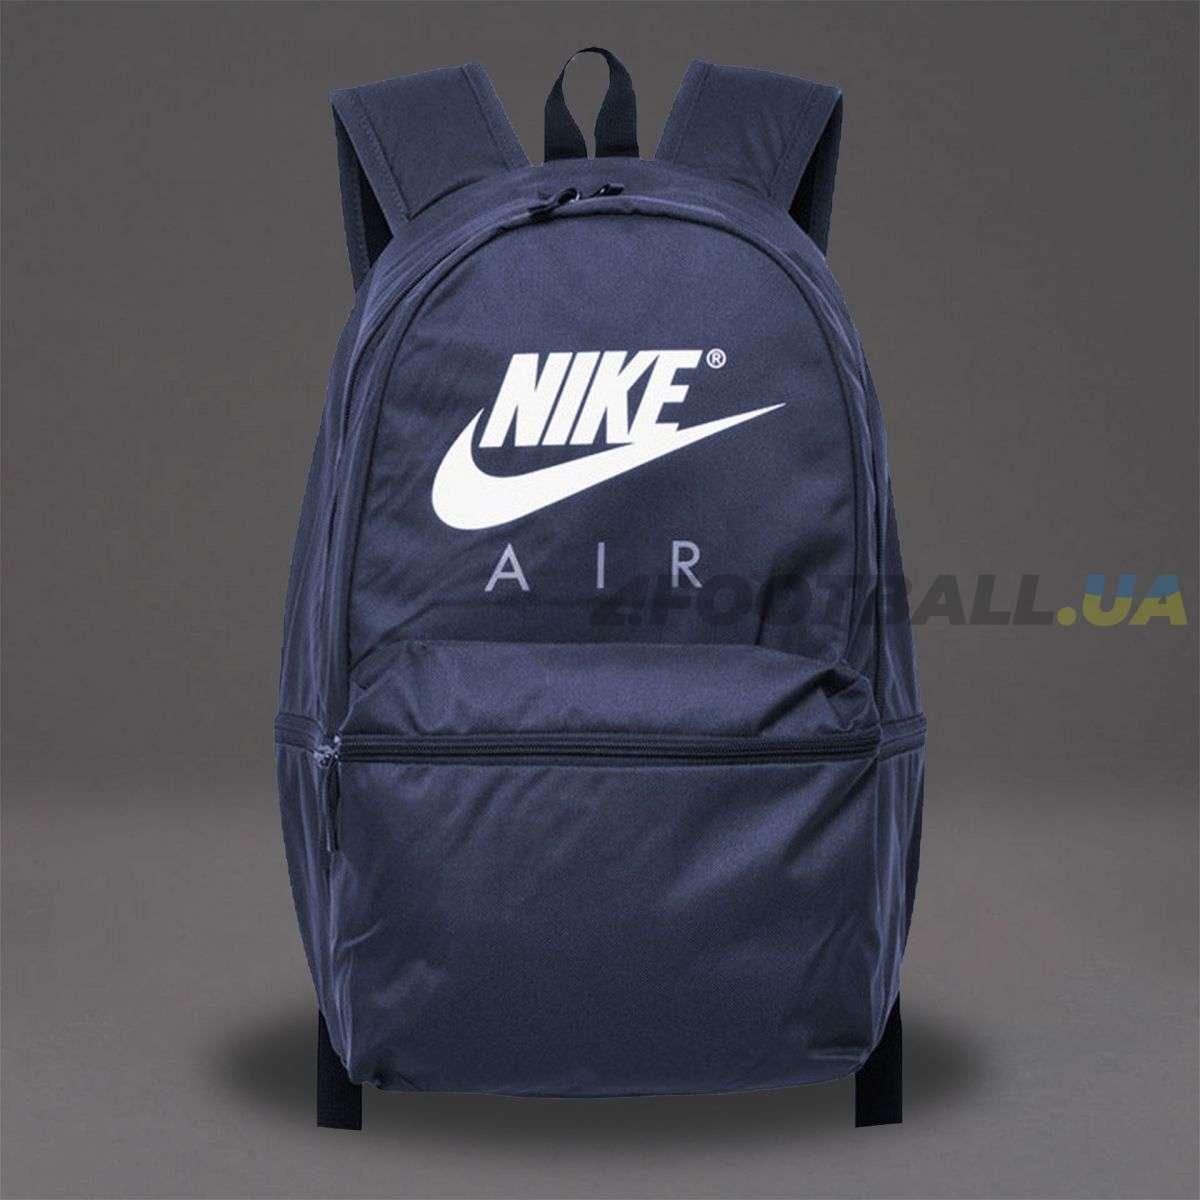 8e9bce2f Рюкзак Nike Air | BA5777-452